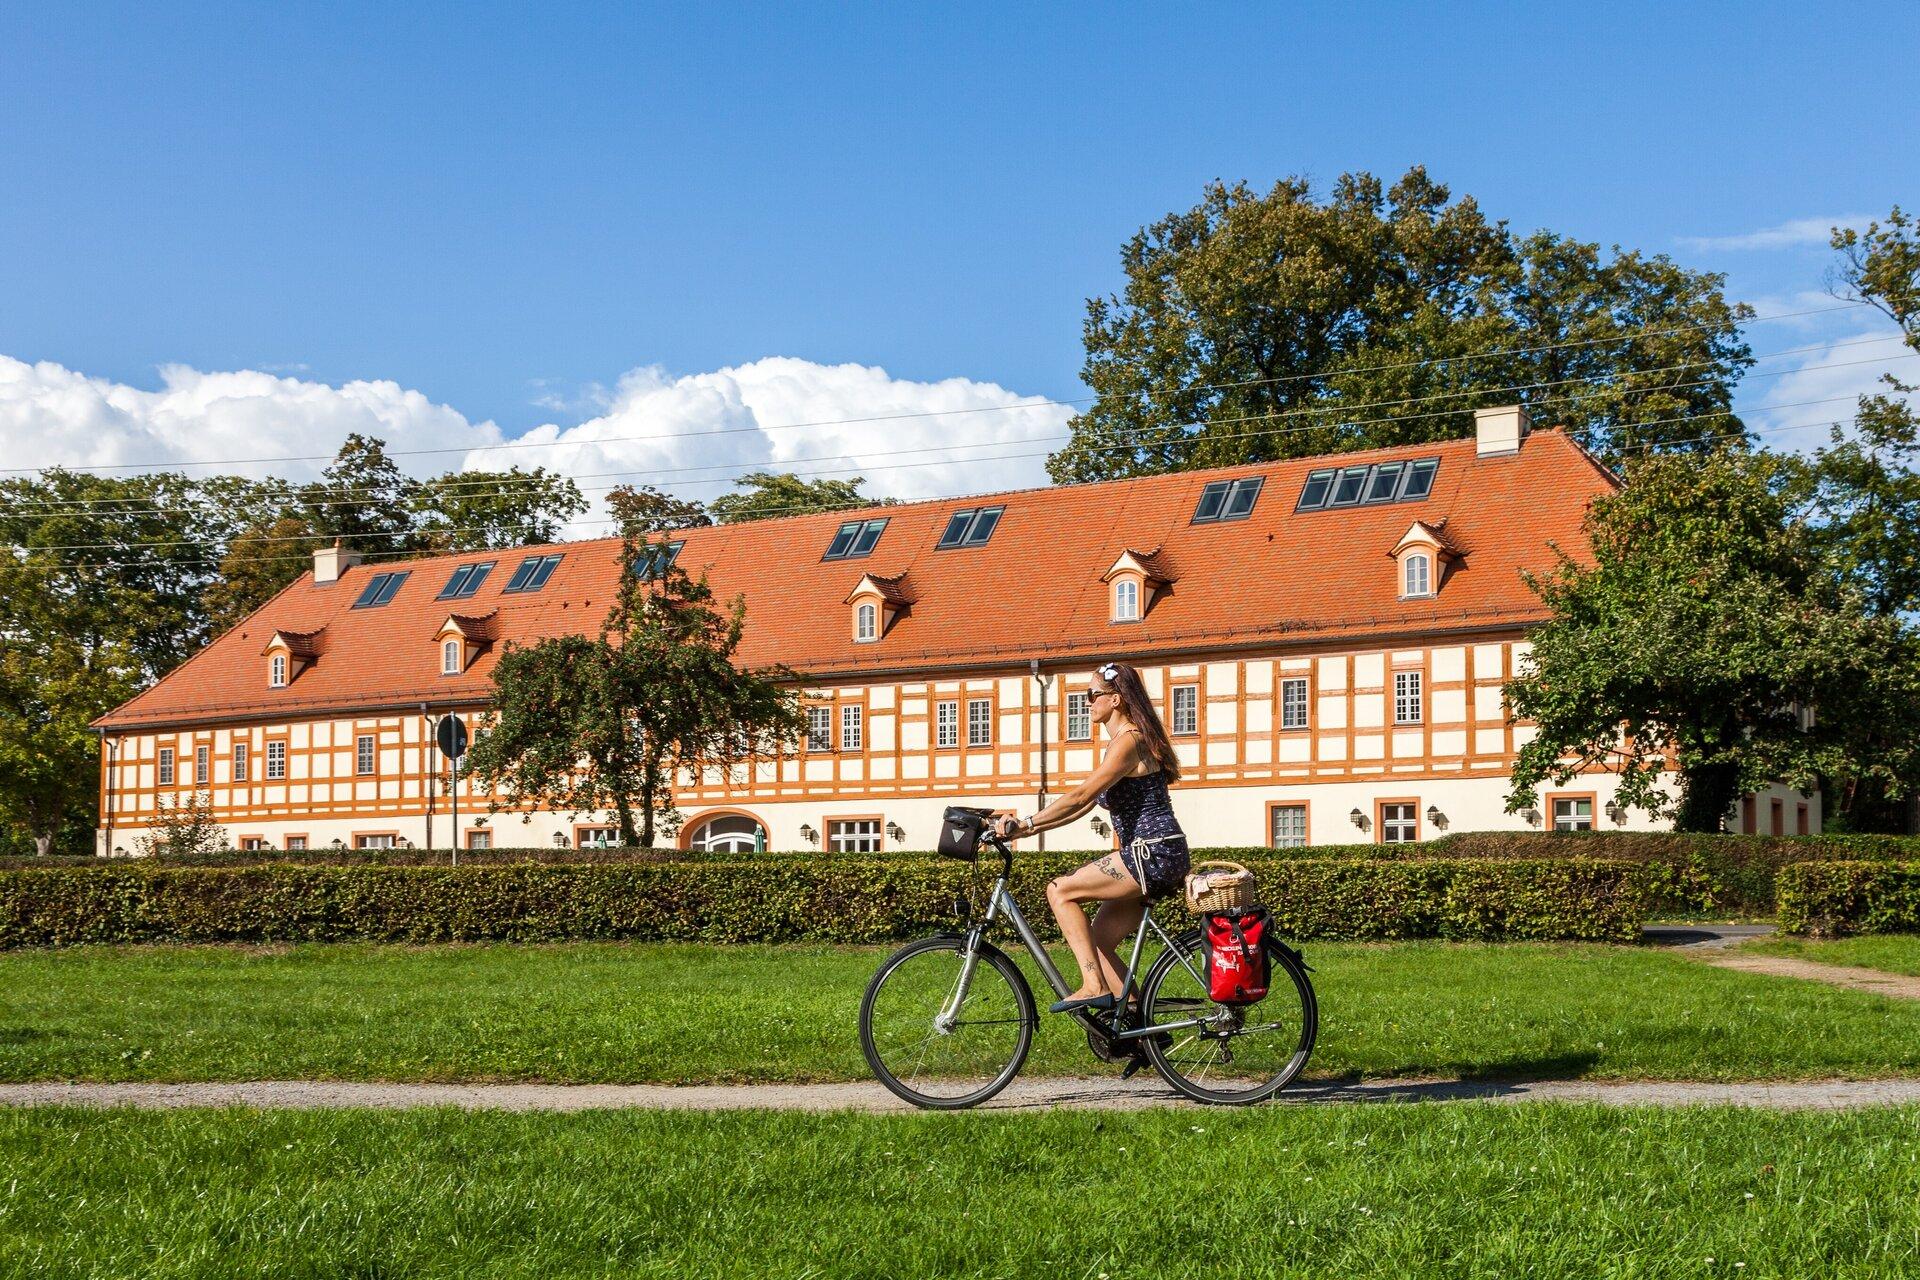 Radfahrer vor dem Lübbenauer Marstall, Foto: Peter Becker